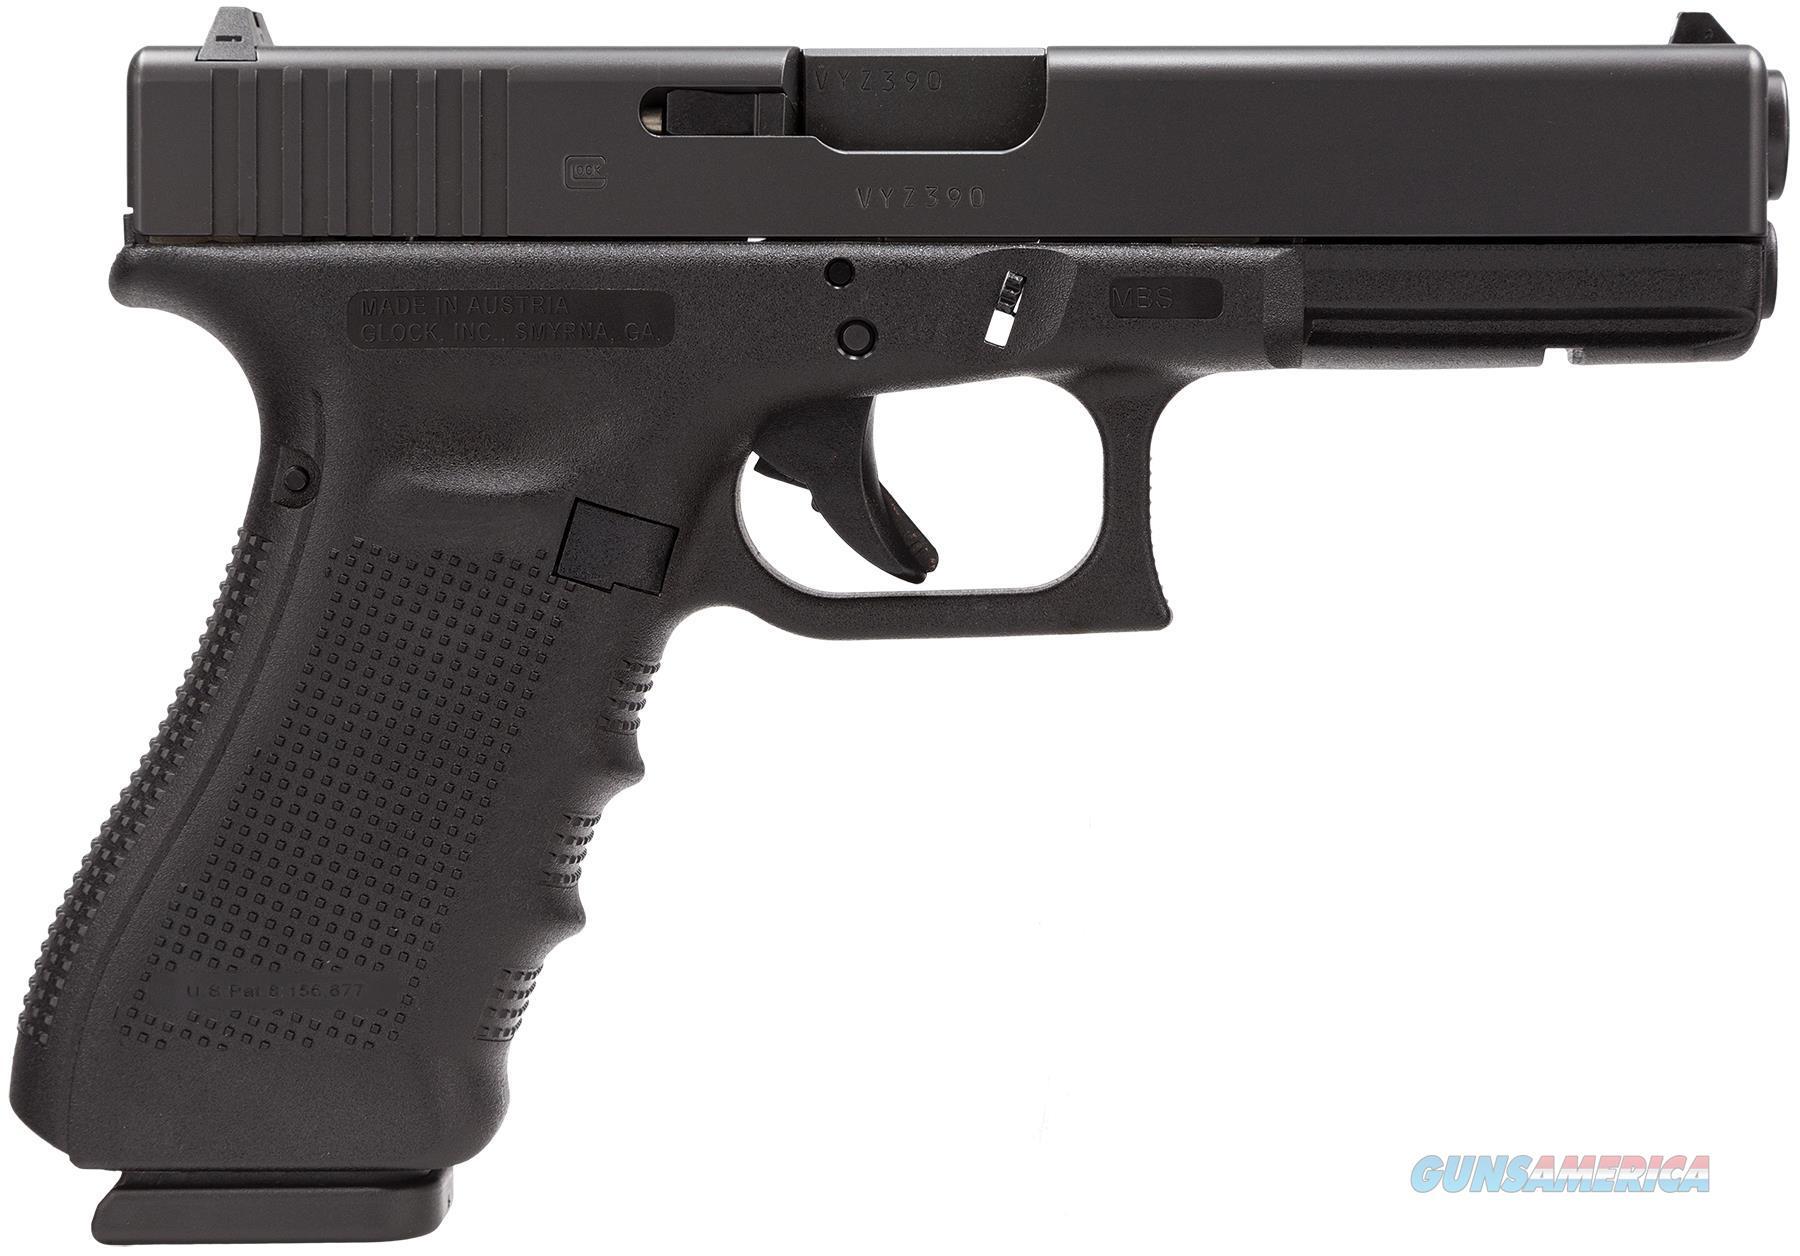 "Glock Pg2250203 G22 Gen 4 Double 40 Smith & Wesson (S&W) 4.48"" 15+1 Black Interchangeable Backstrap Grip Black PG2250203  Guns > Pistols > G Misc Pistols"